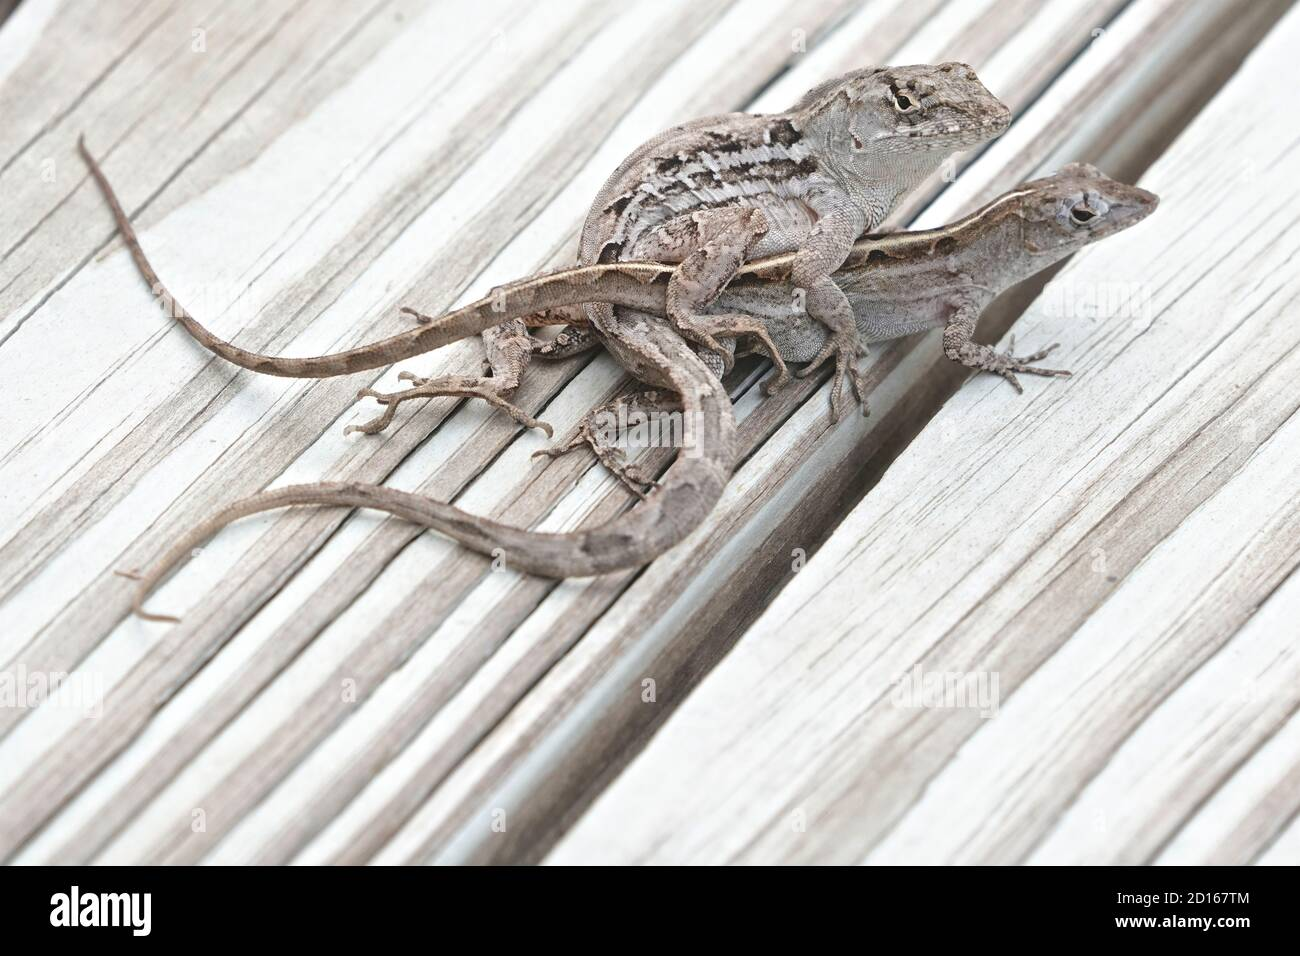 Cría Florida Scrub Lizards, Scopelporus woodi Foto de stock